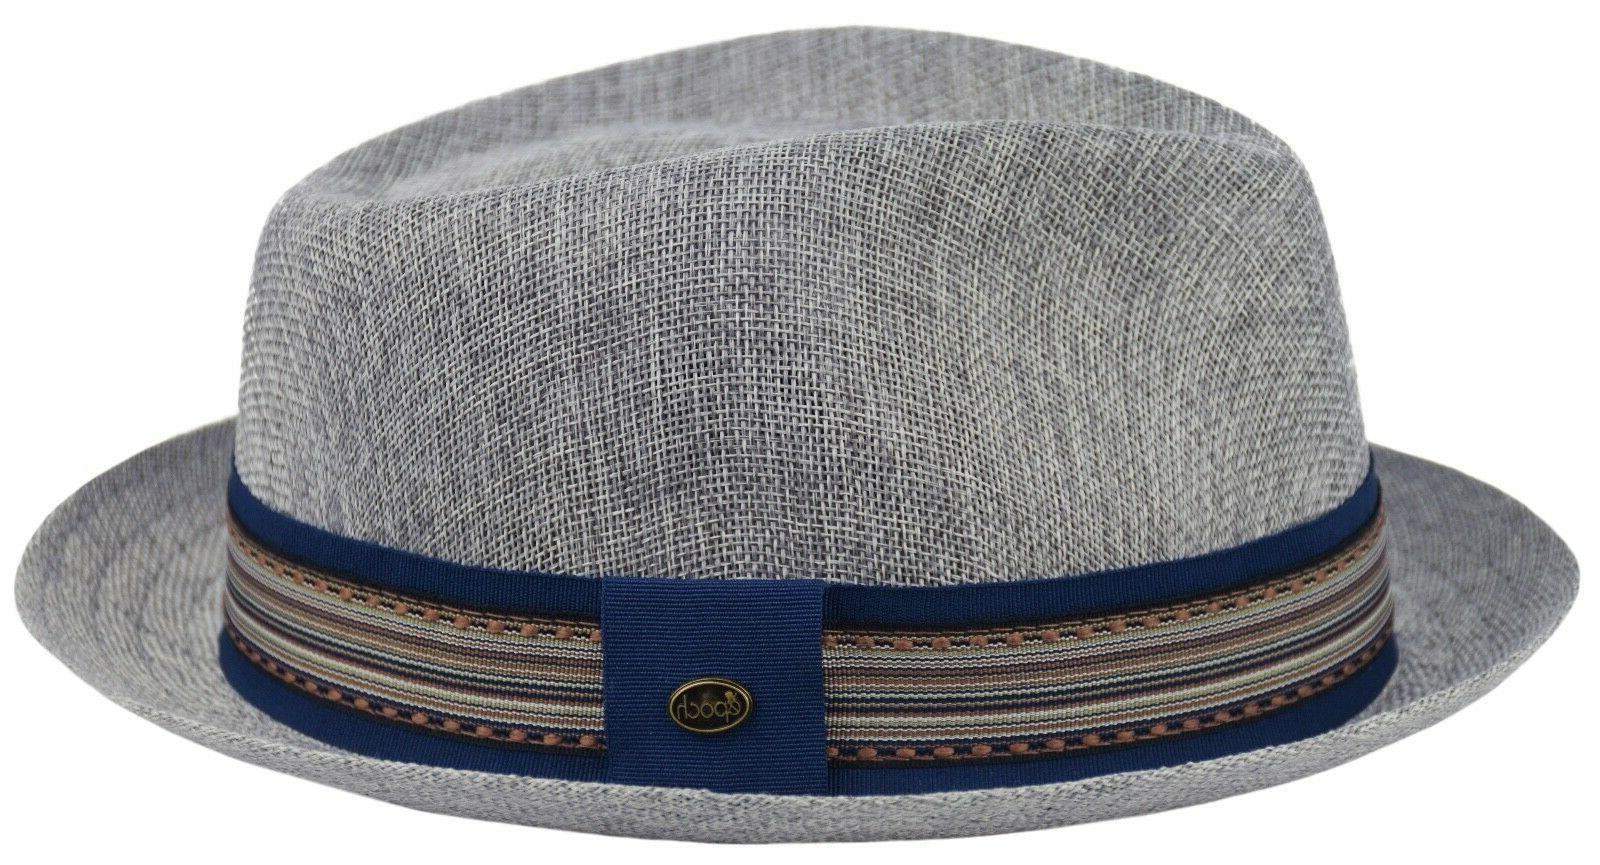 Men's Summer Linen Derby Fedora, Breathable, Tribal Stingy Brim Hat Gray F2805